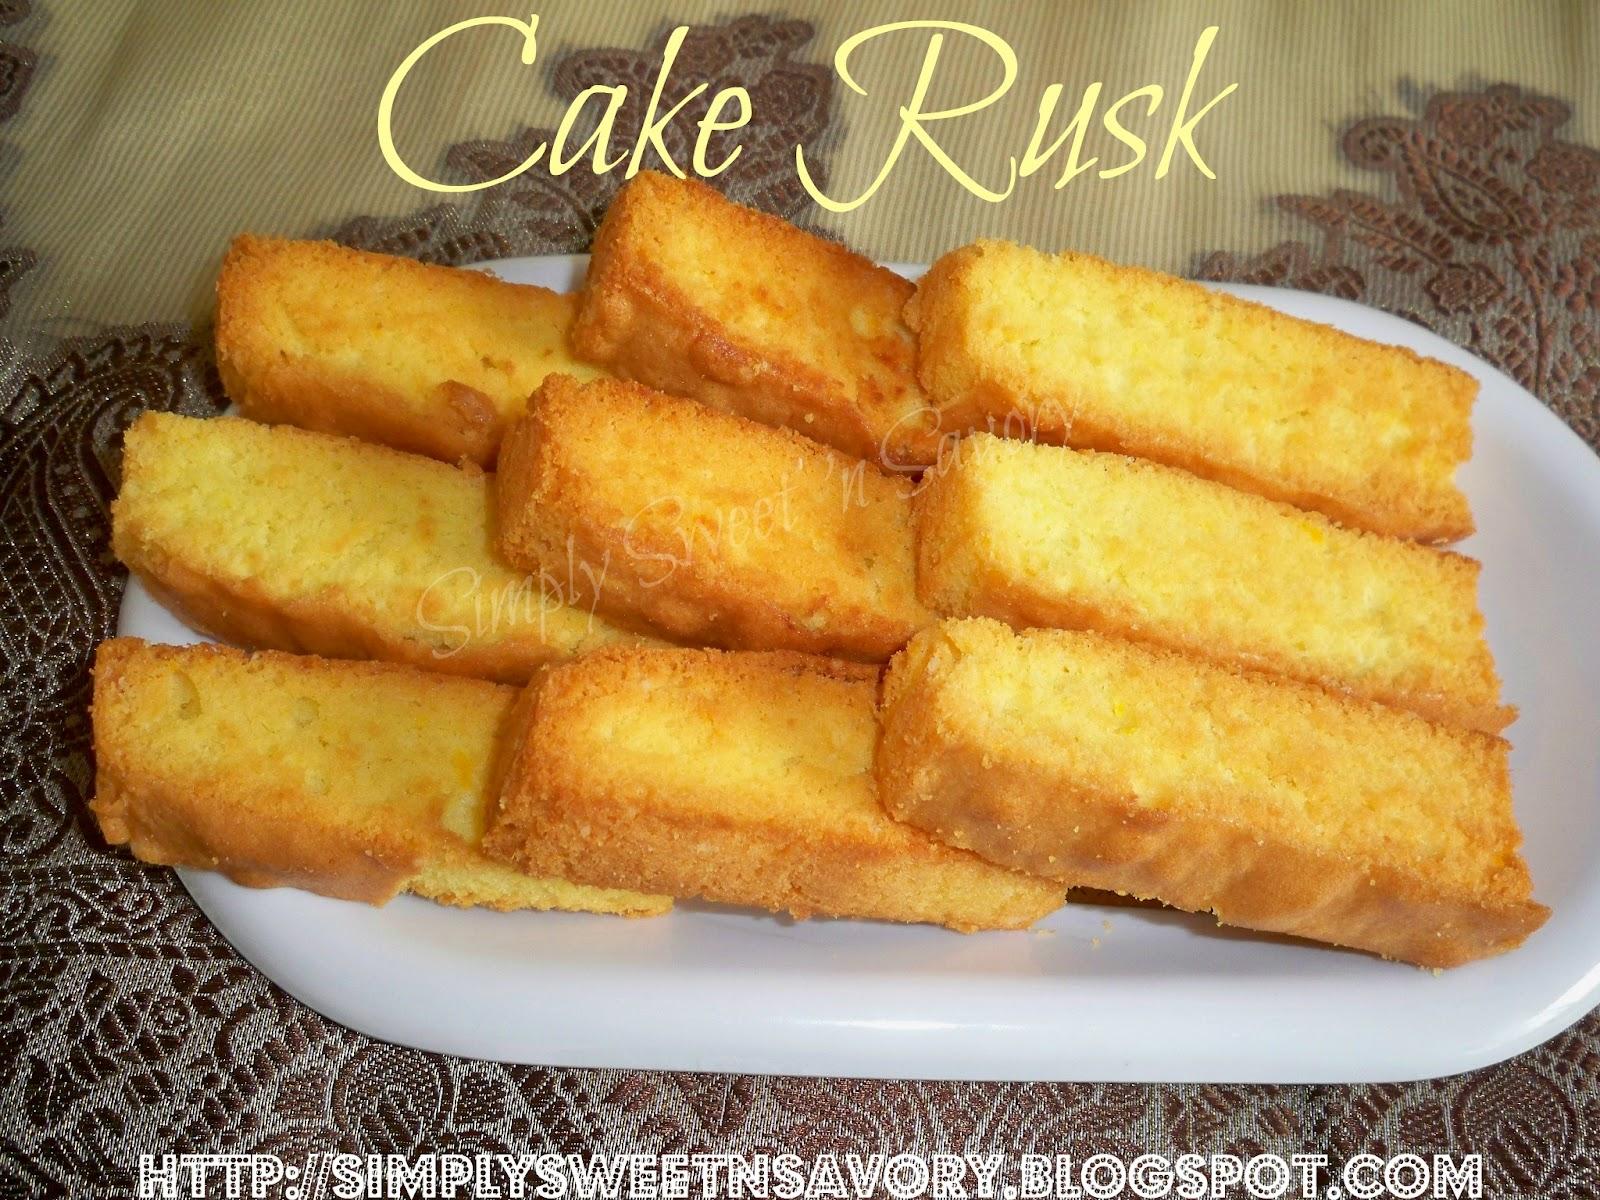 Cake Rusk Recipe Video